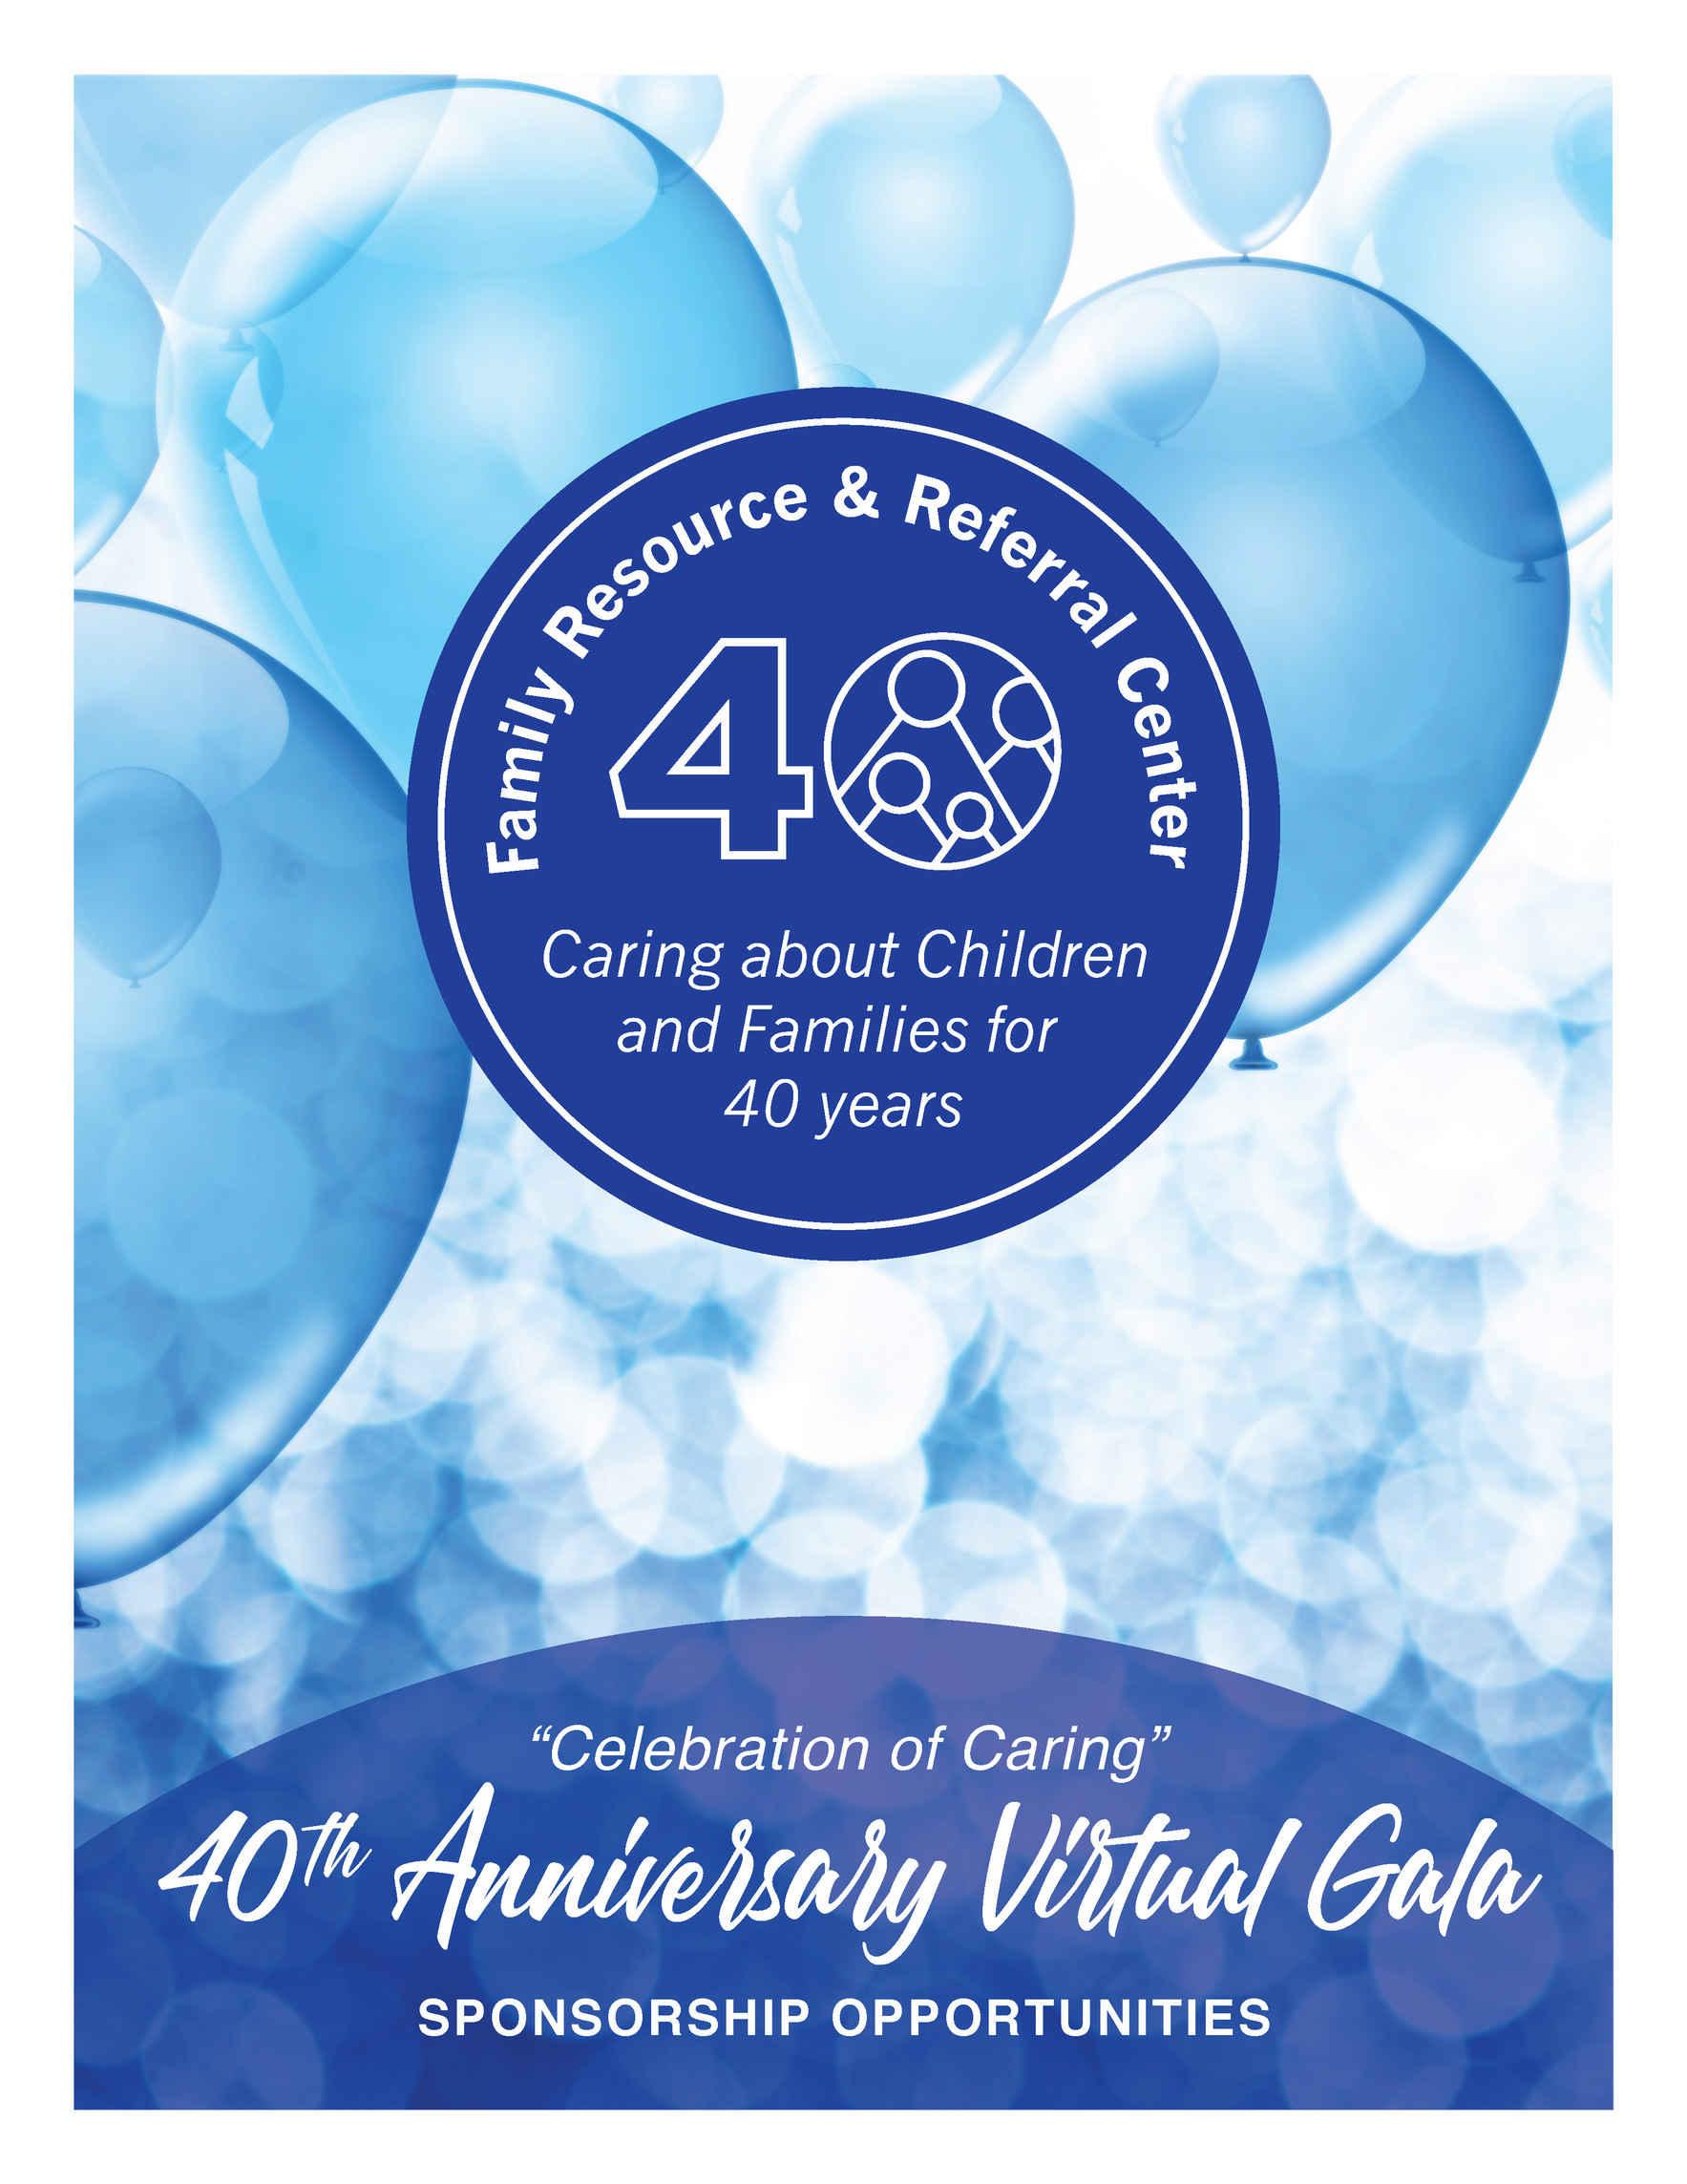 """Celebration of Caring"" 40th Anniversary Virtual Gala image"